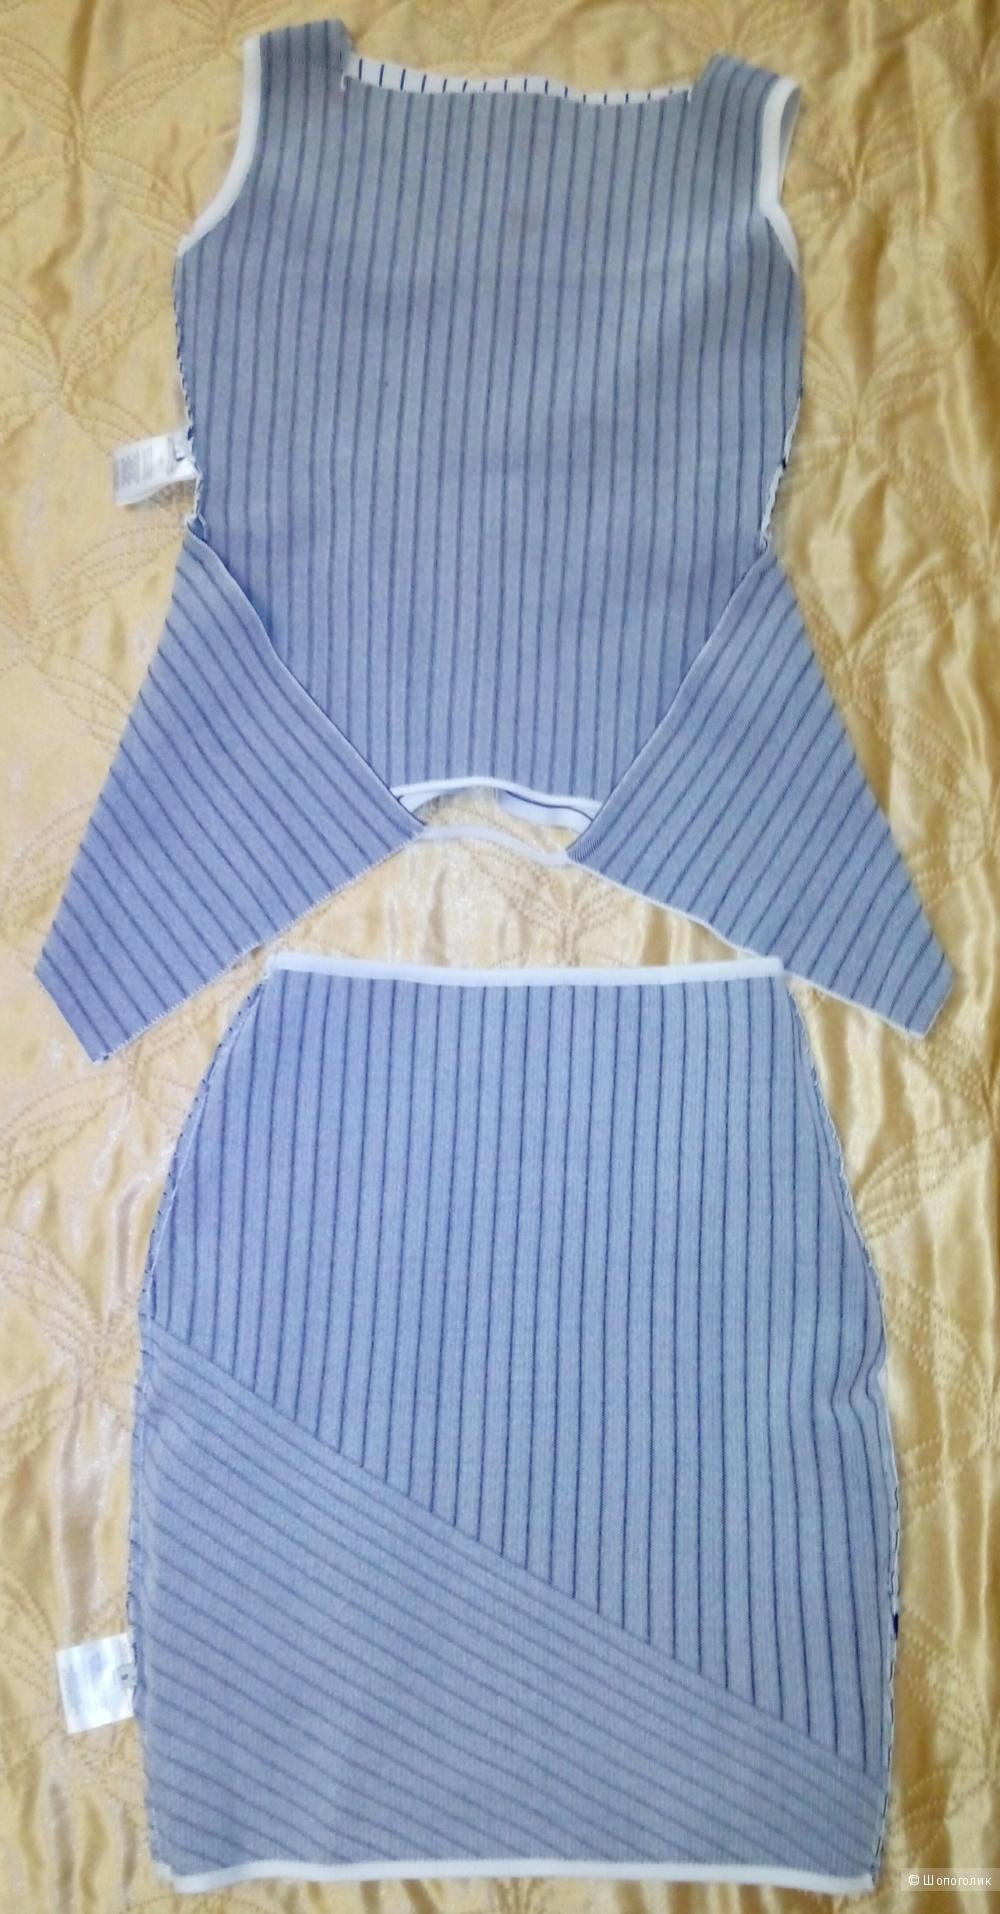 Костюм (топ и юбка) 3.1 PhilippLim 44 размер